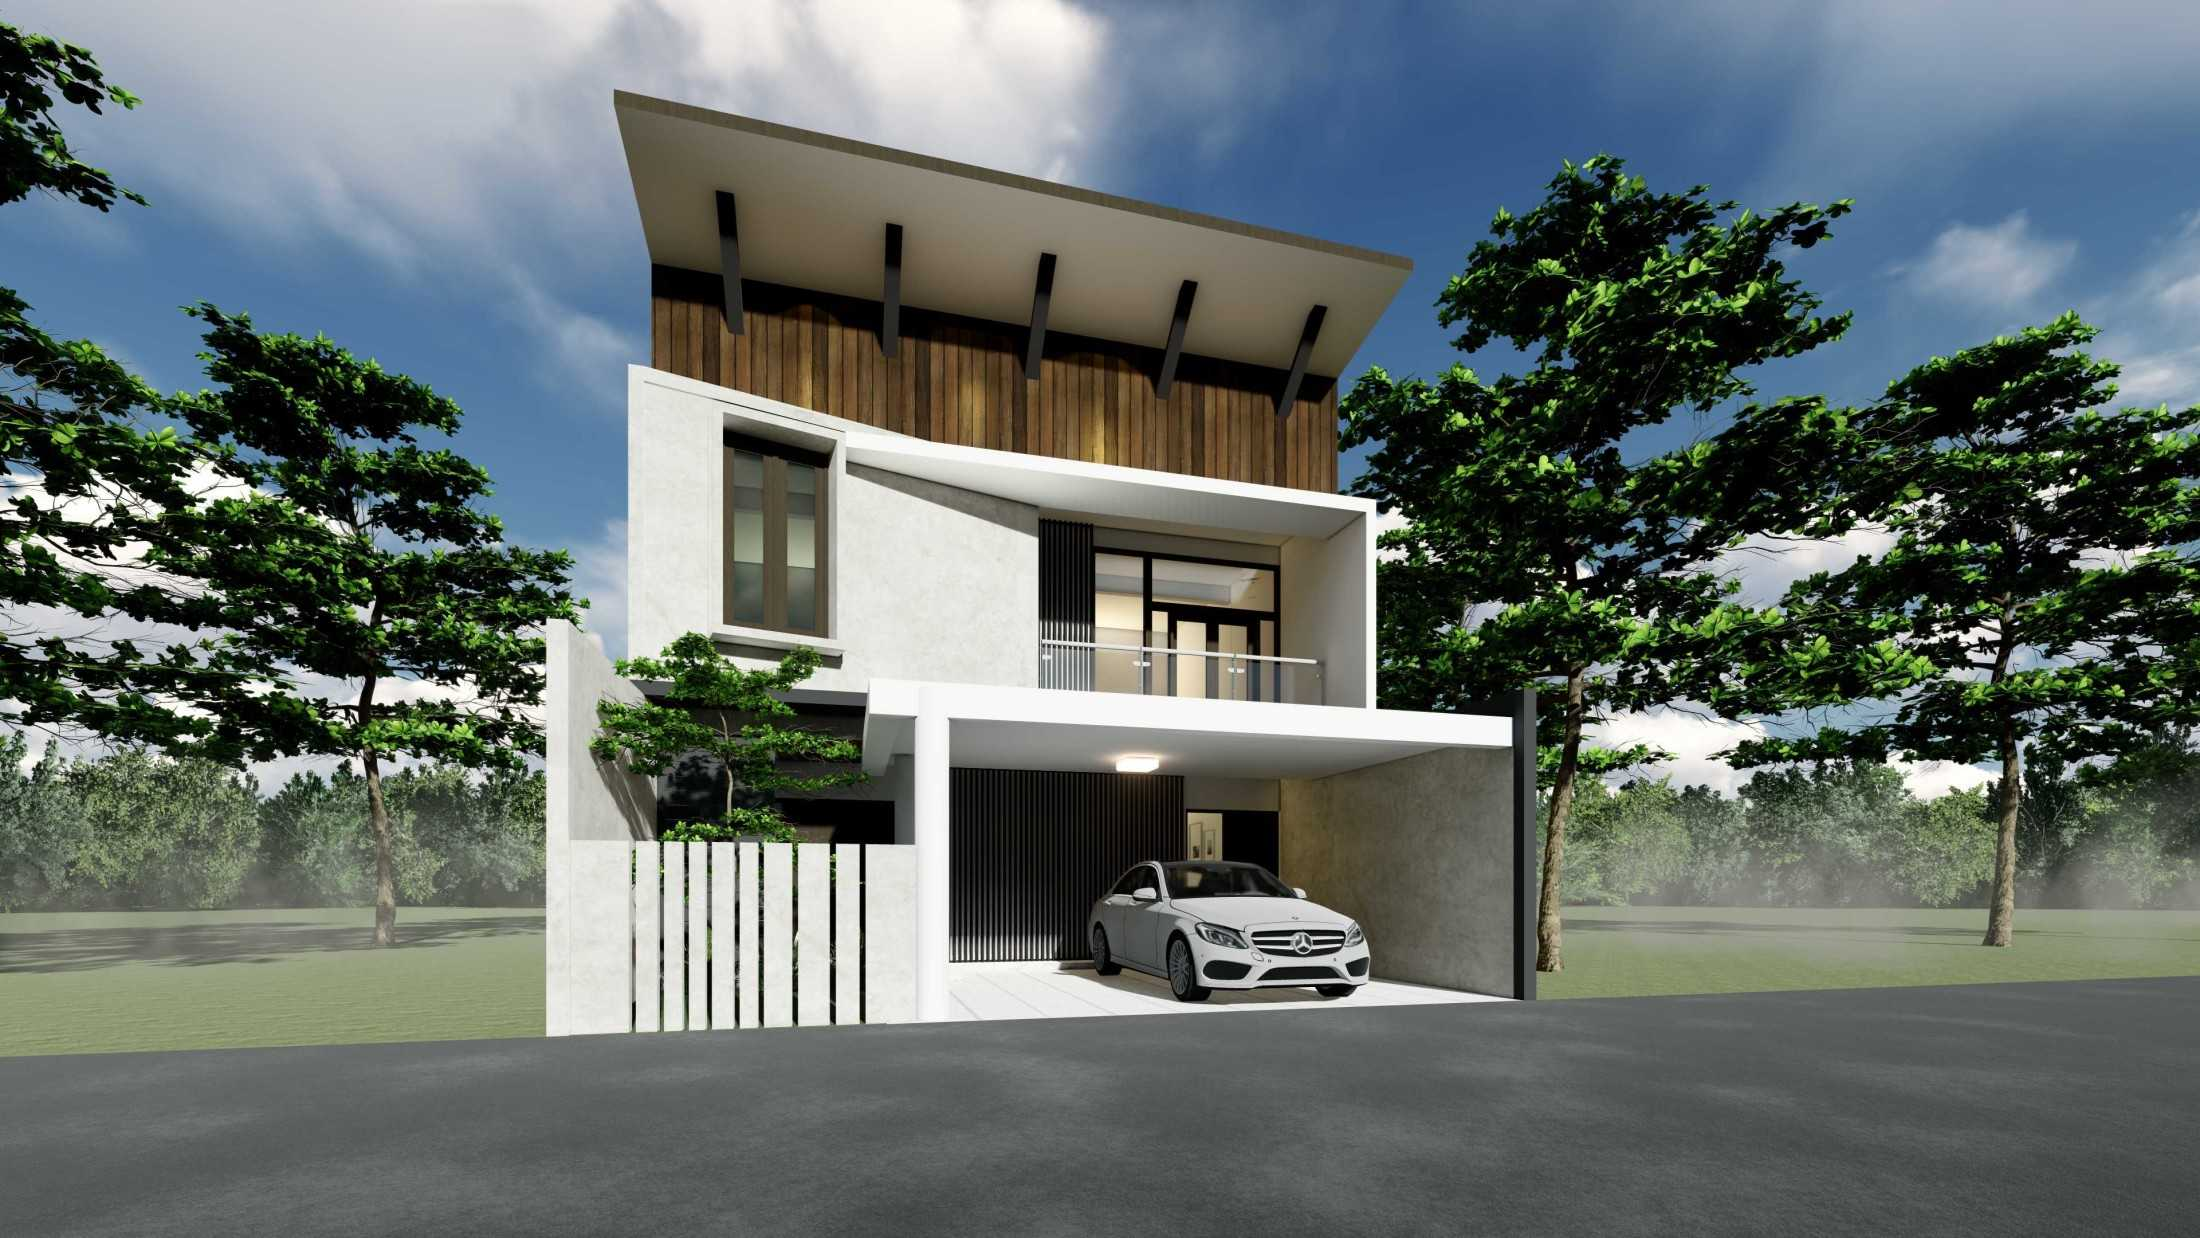 Astabumi Studio Rb House Bandung Bandung, Kota Bandung, Jawa Barat, Indonesia Klaten, Kabupaten Klaten, Jawa Tengah, Indonesia Cv-Astabumi-Manunggal-Prakarsa-Prambanan-Reading-Room  119322